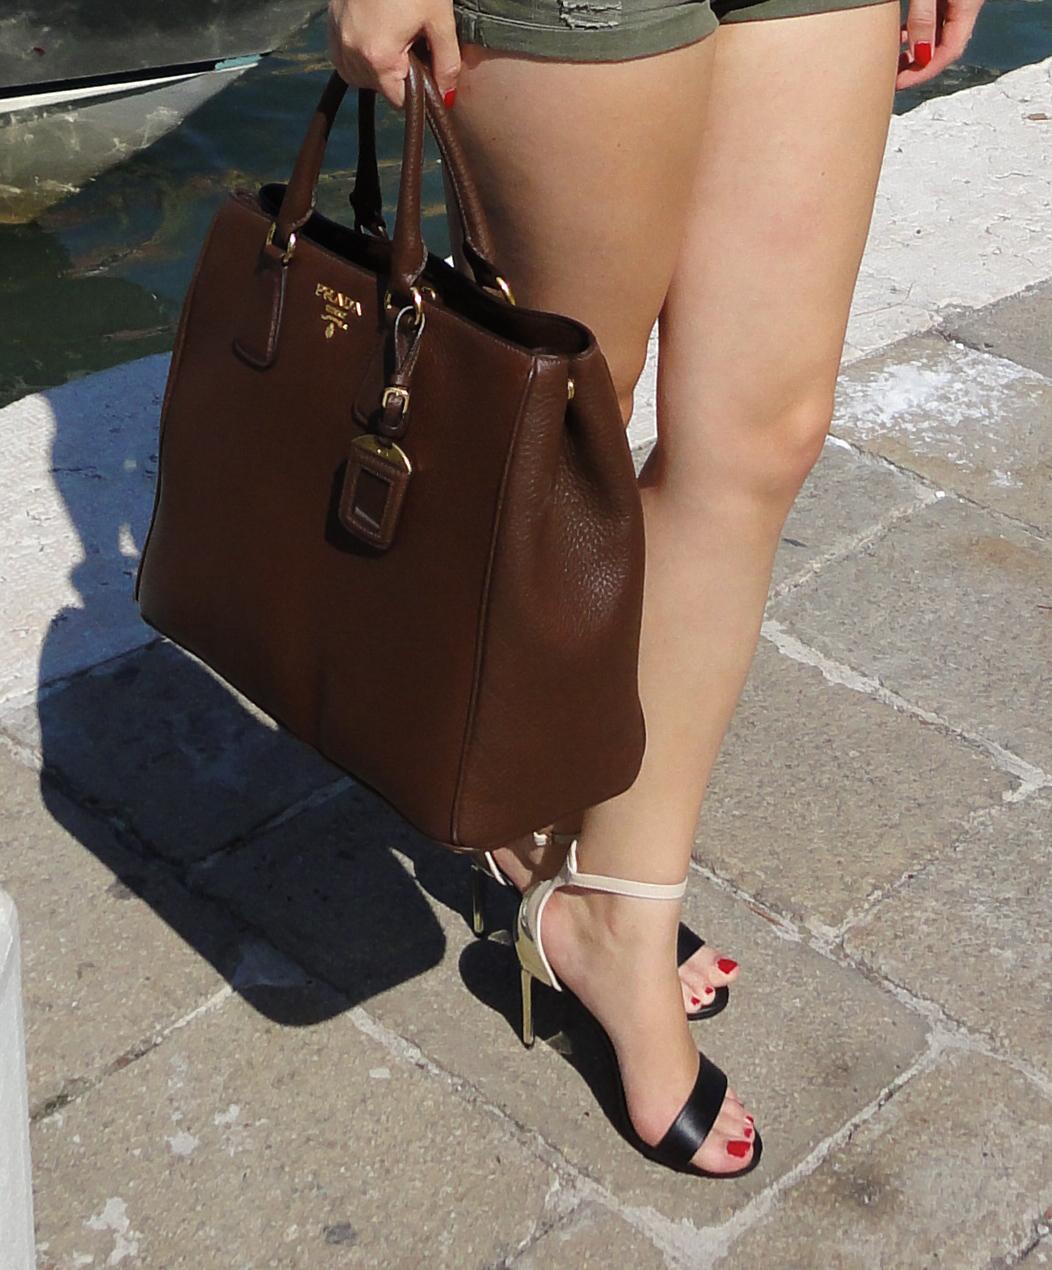 Venedig Streetstyle Outfit Modeblog Beatles Shirt Hotpants Heels Prada Tasche Braun